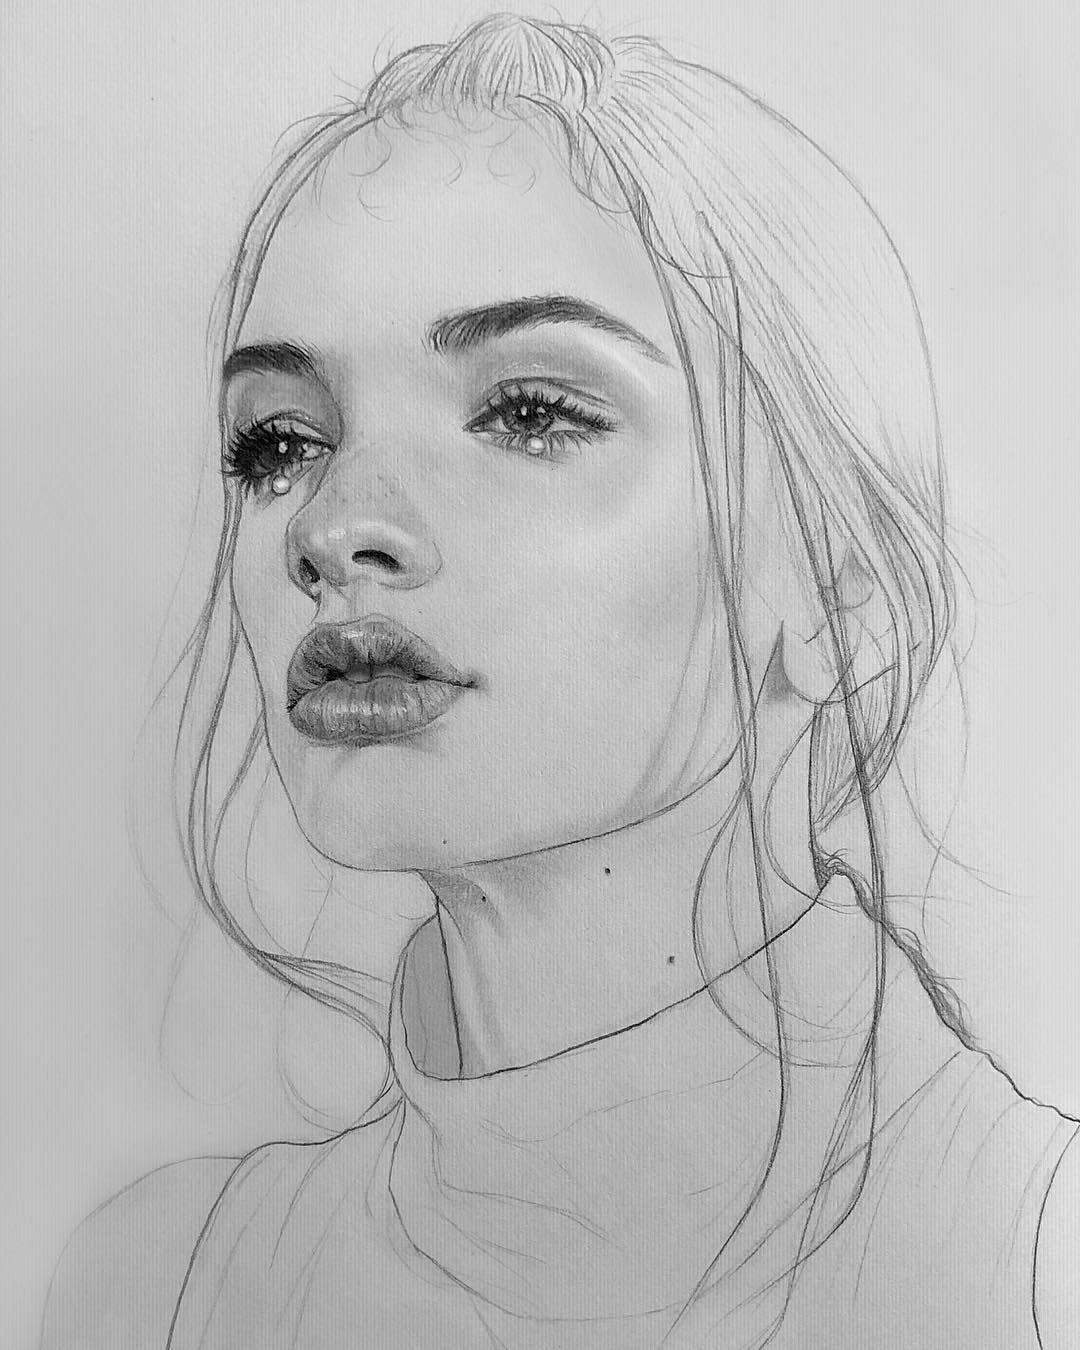 картинки портретов рисунок карандашом модели гардин